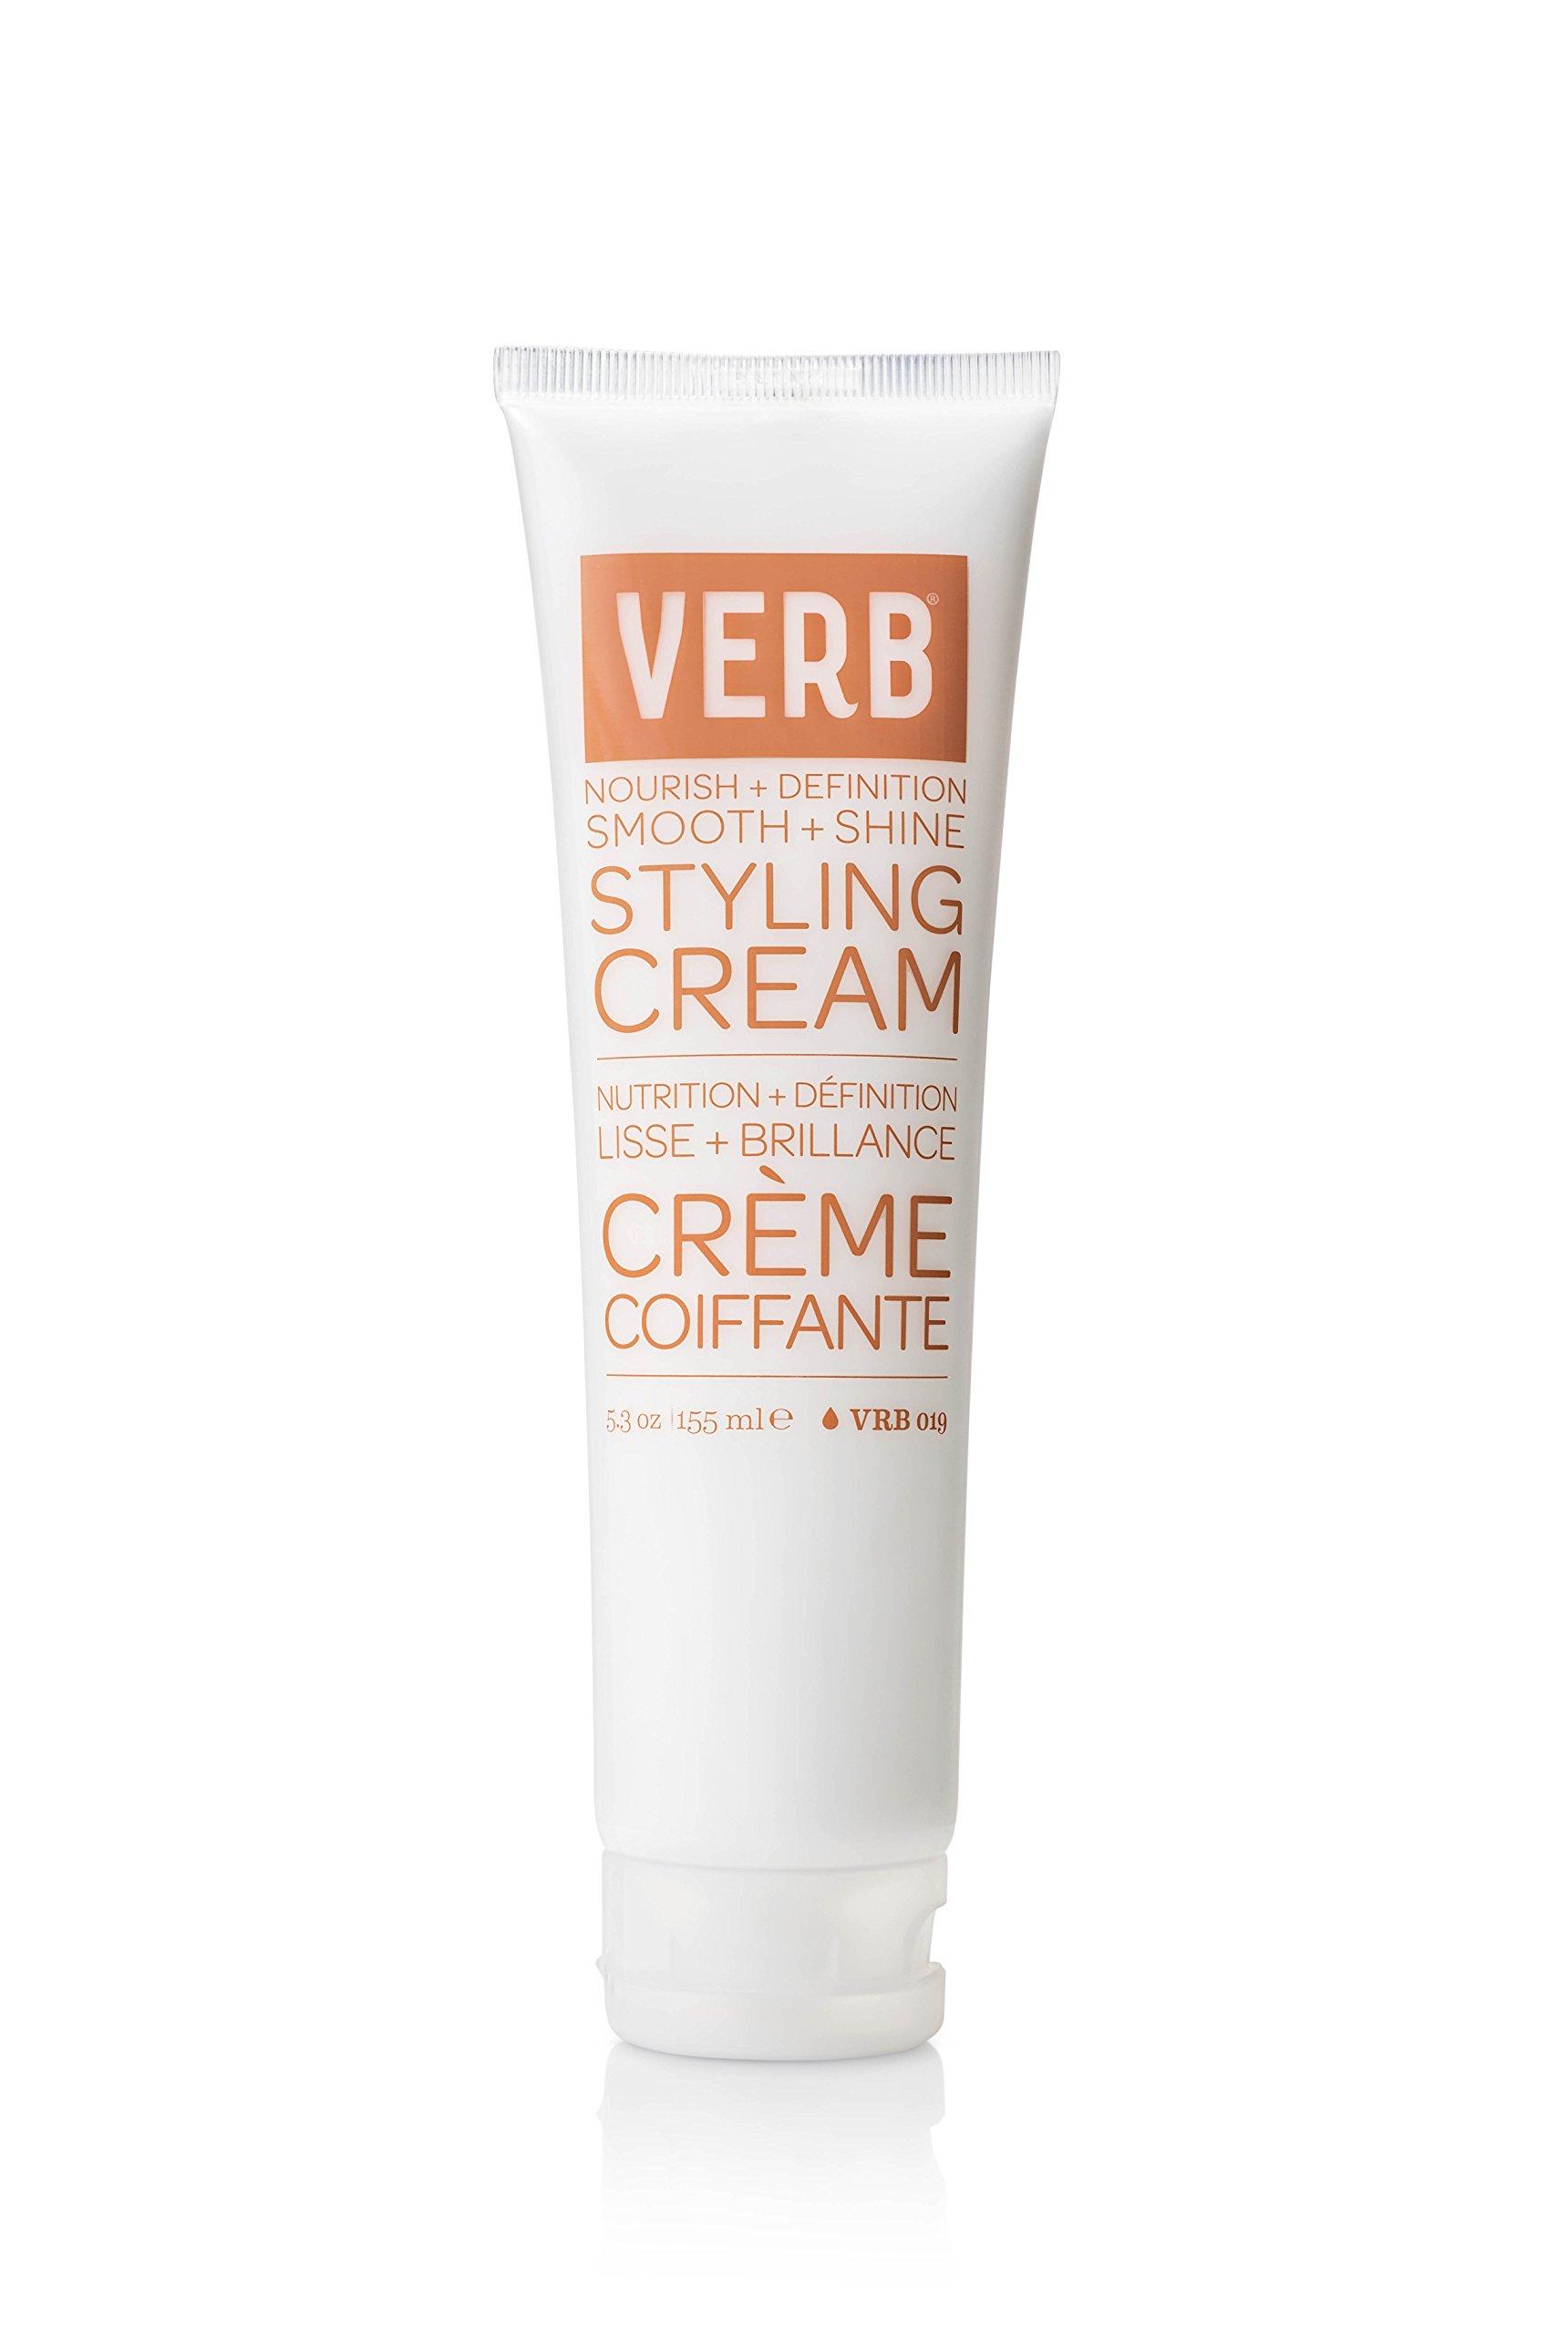 Verb Styling Cream - Nourish + Definition + Smooth + Shine 5.3 oz by verb